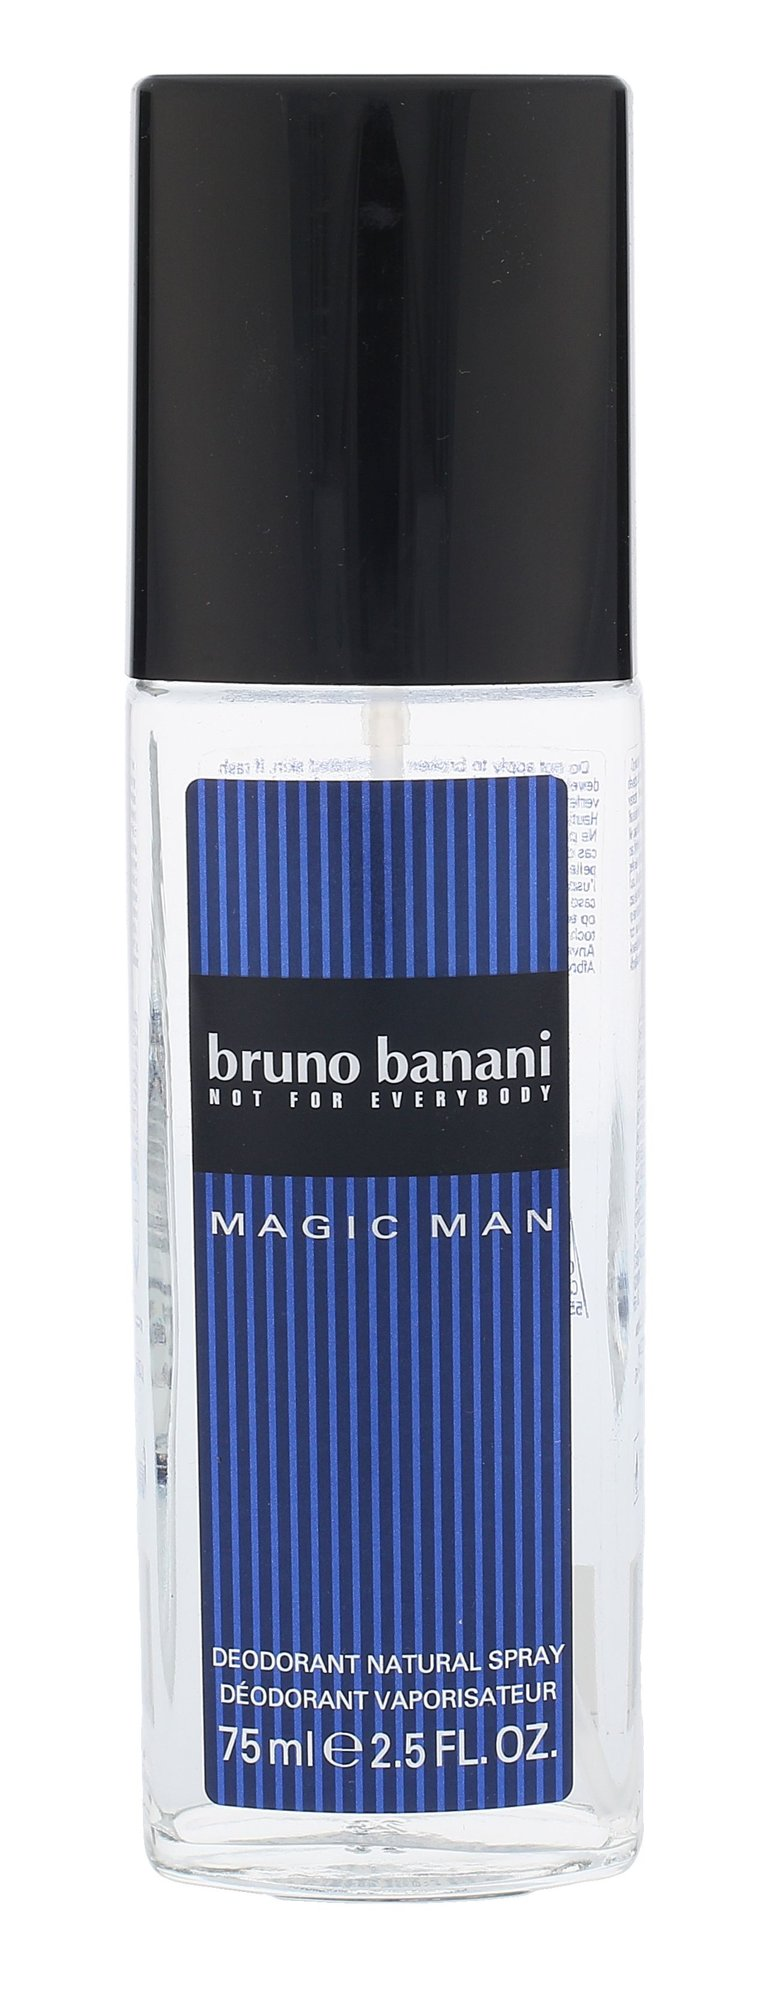 Bruno Banani Magic Man Deodorant 75ml